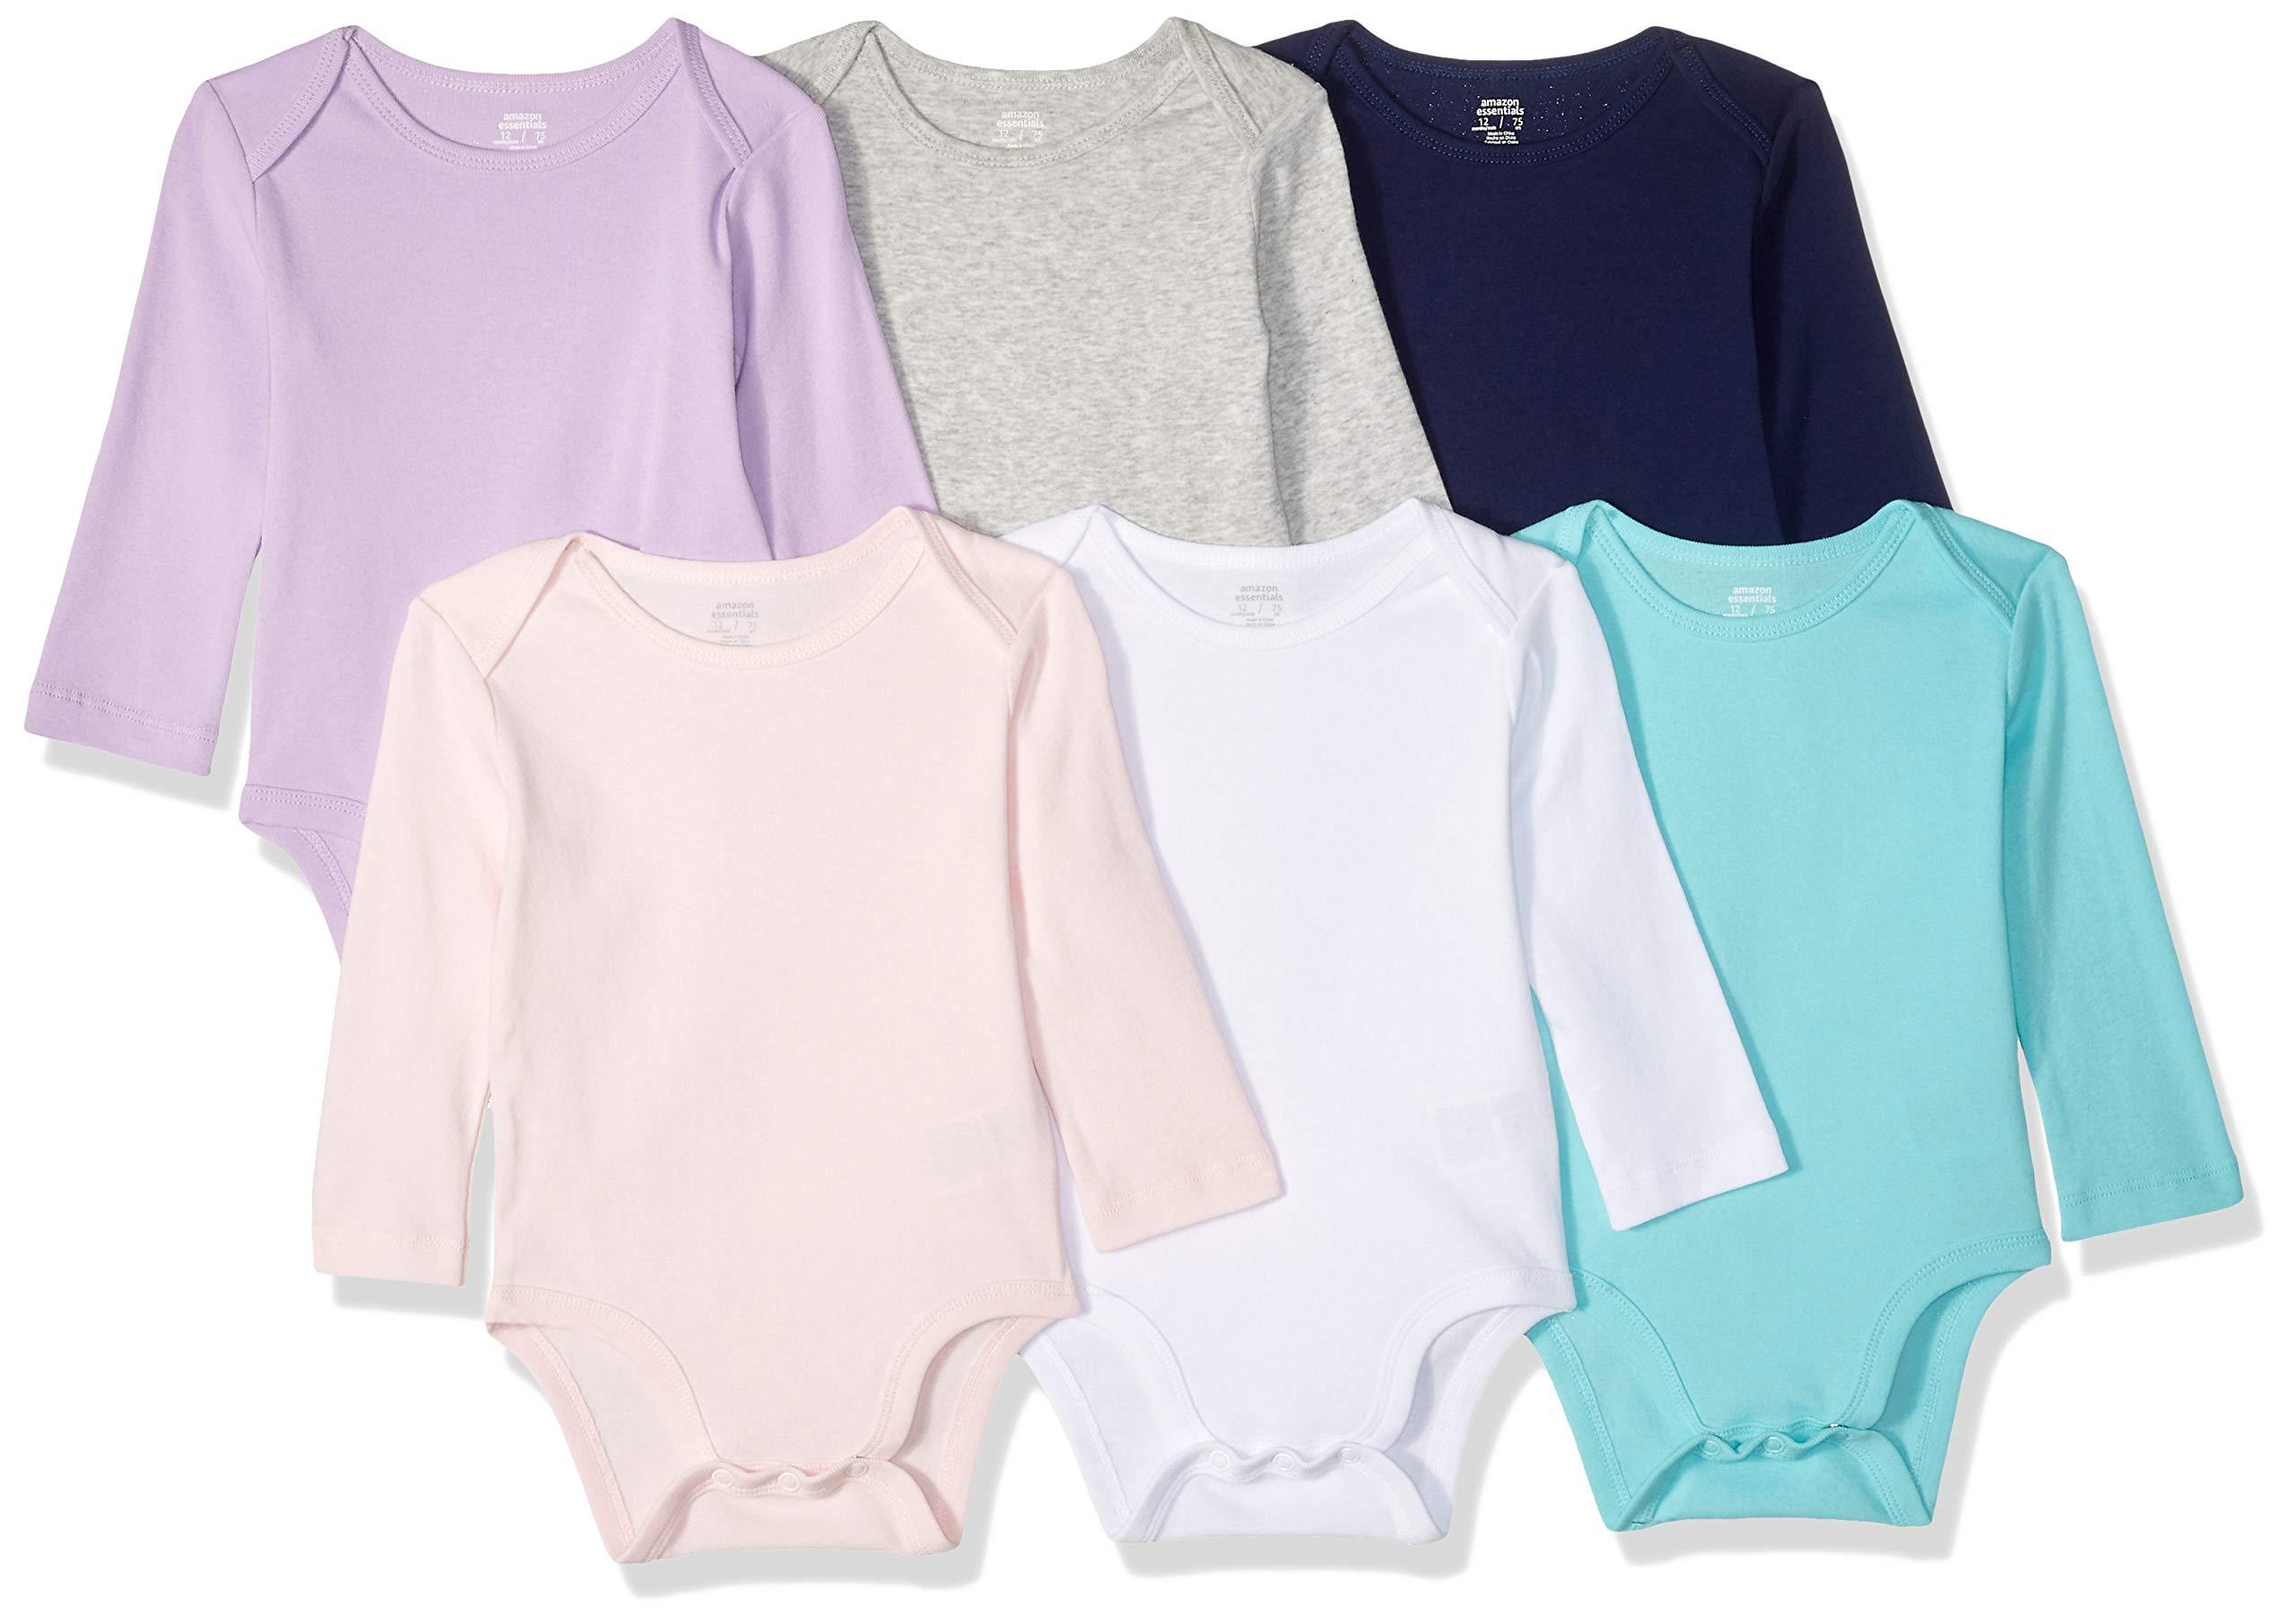 Amazon Essentials Baby Long-Sleeve Bodysuits